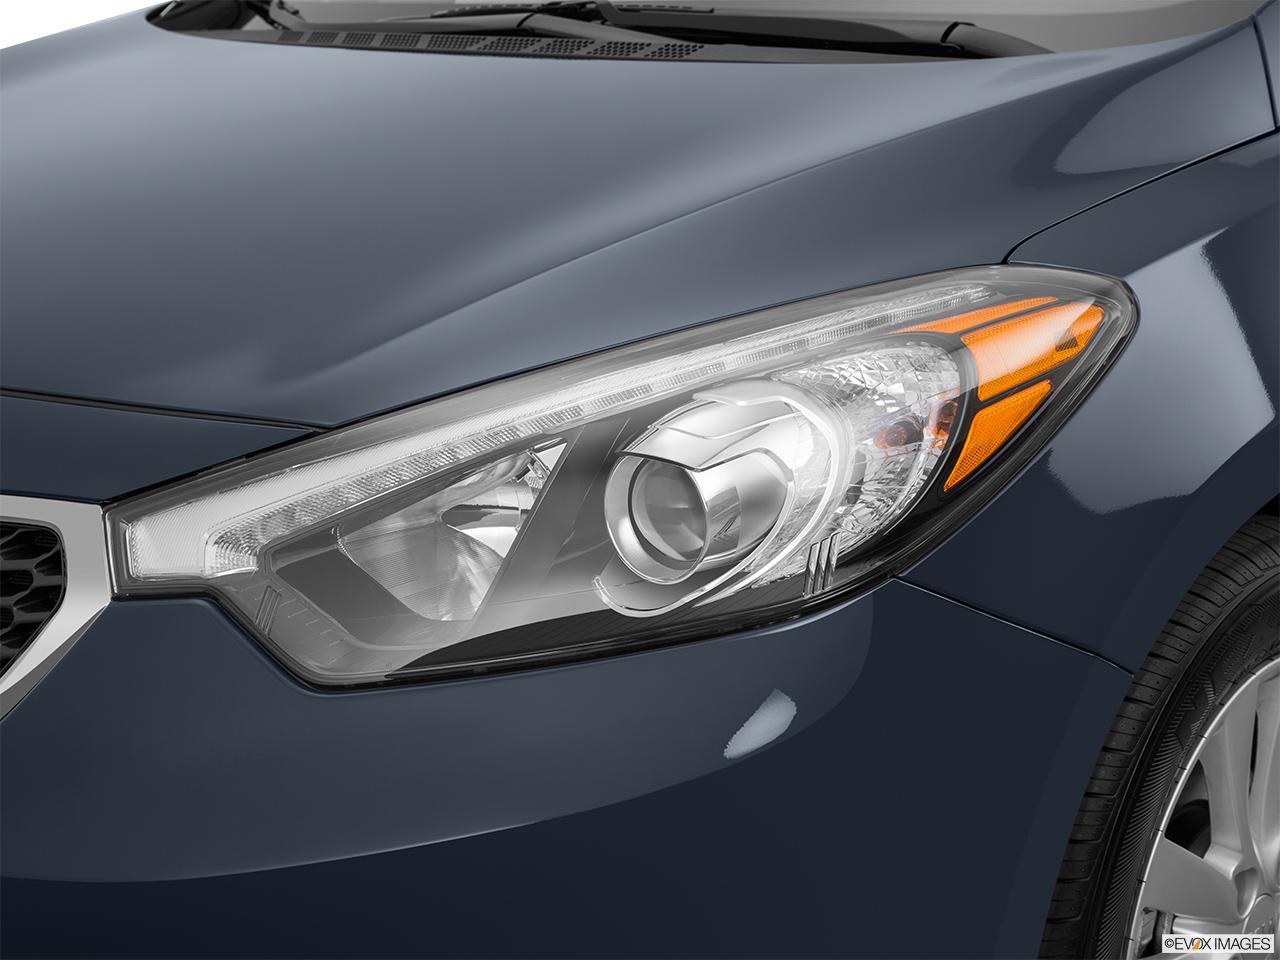 2015 Kia Forte Manual Lx Sedan Front Angle View Headlight Drivers Side